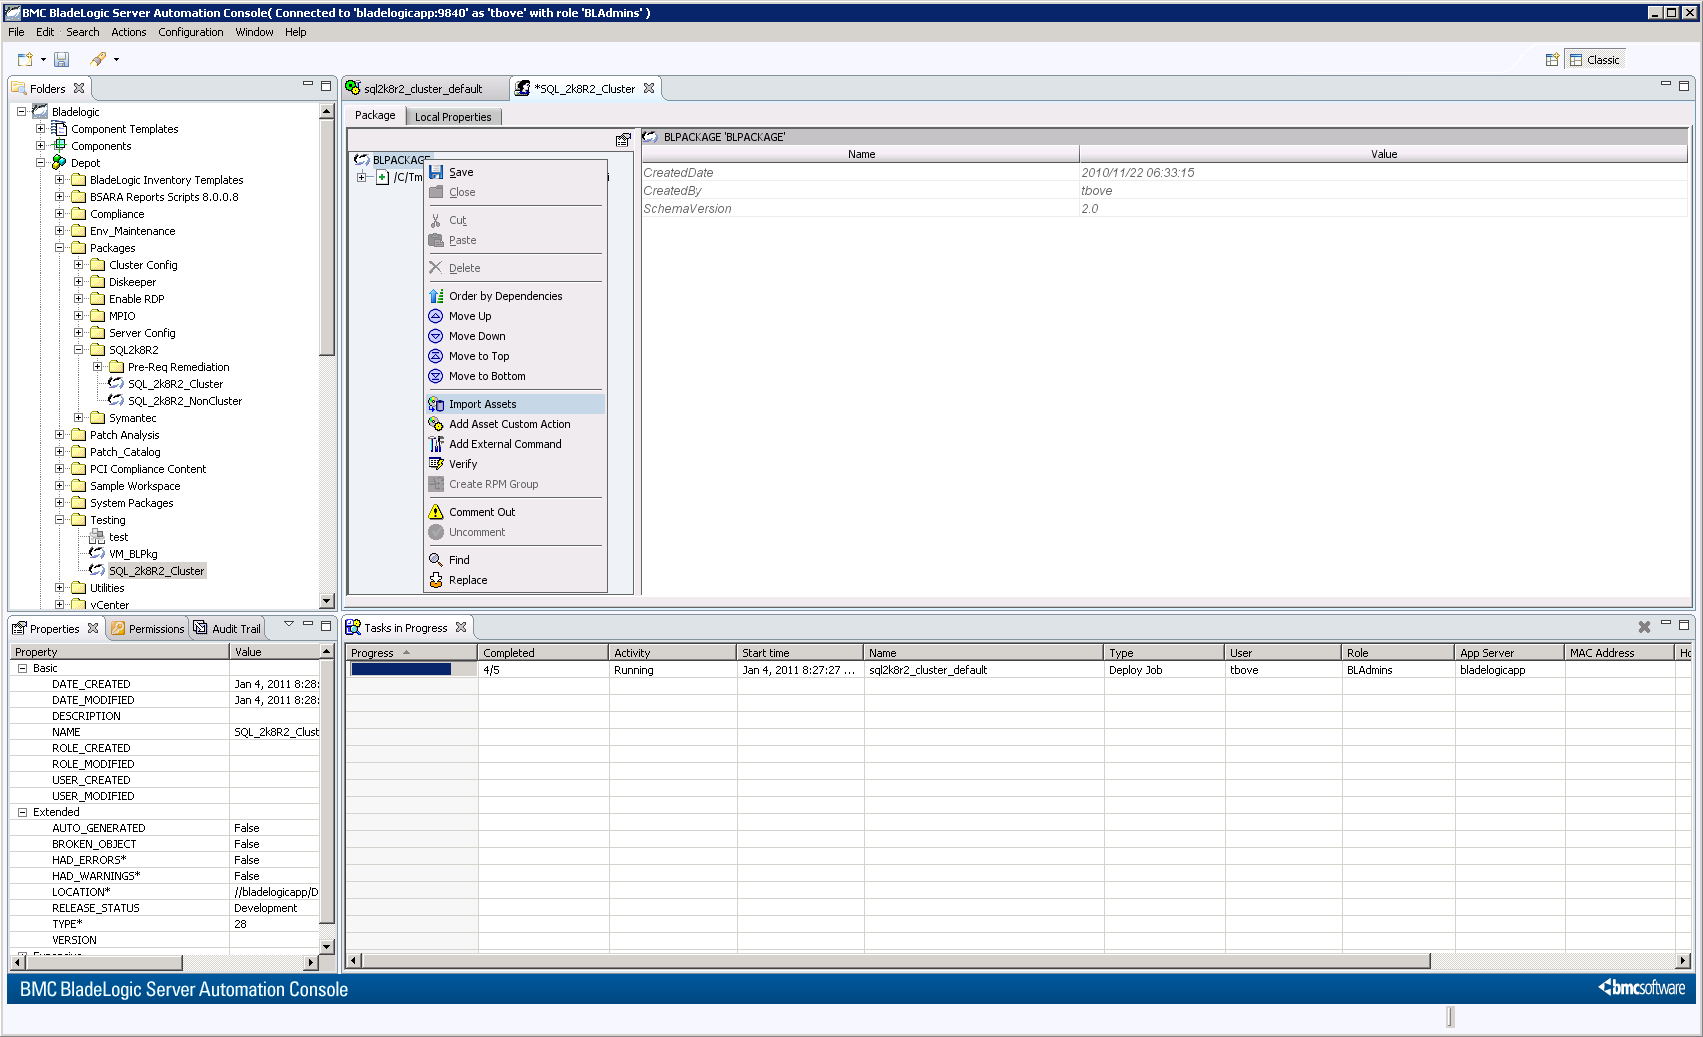 sql server 2008 documentation